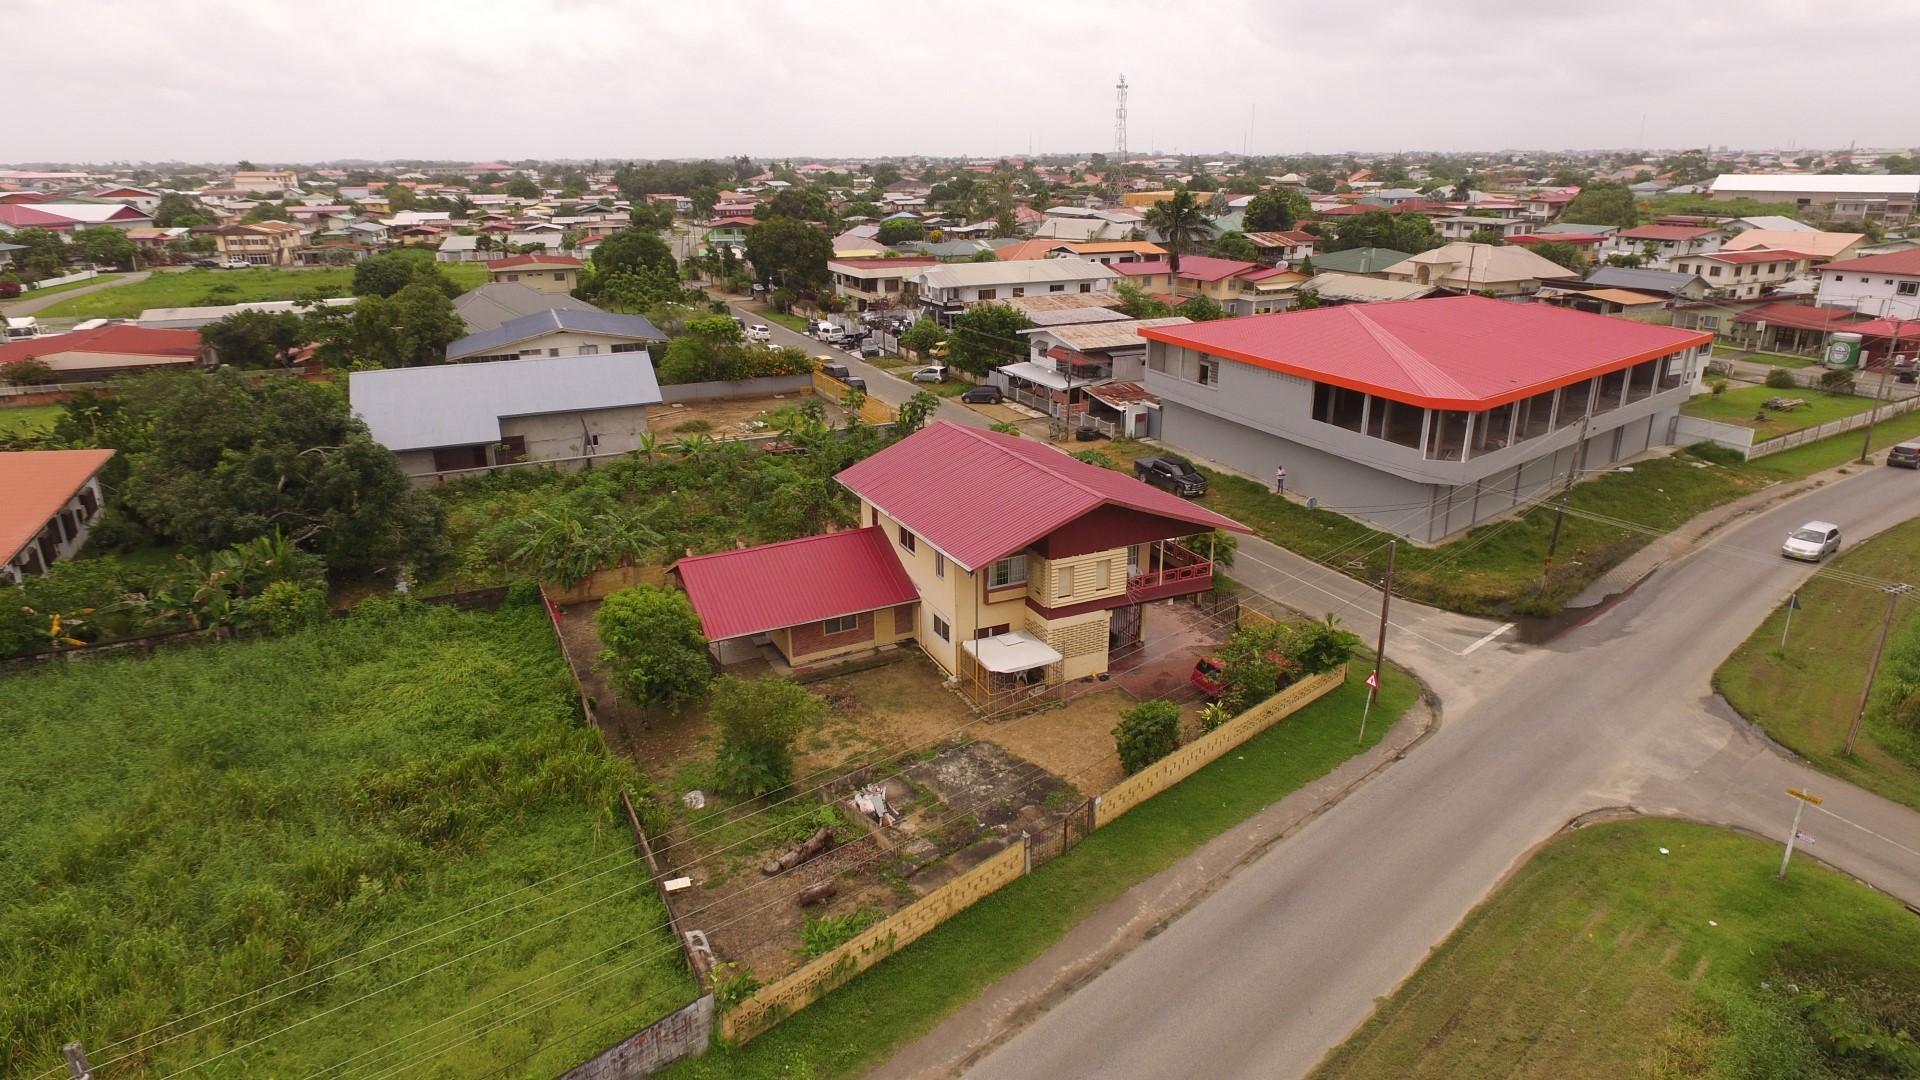 Henkielaan-32-Koopwoning-Terzol-Vastgoed-Paramaribo-Suriname-04